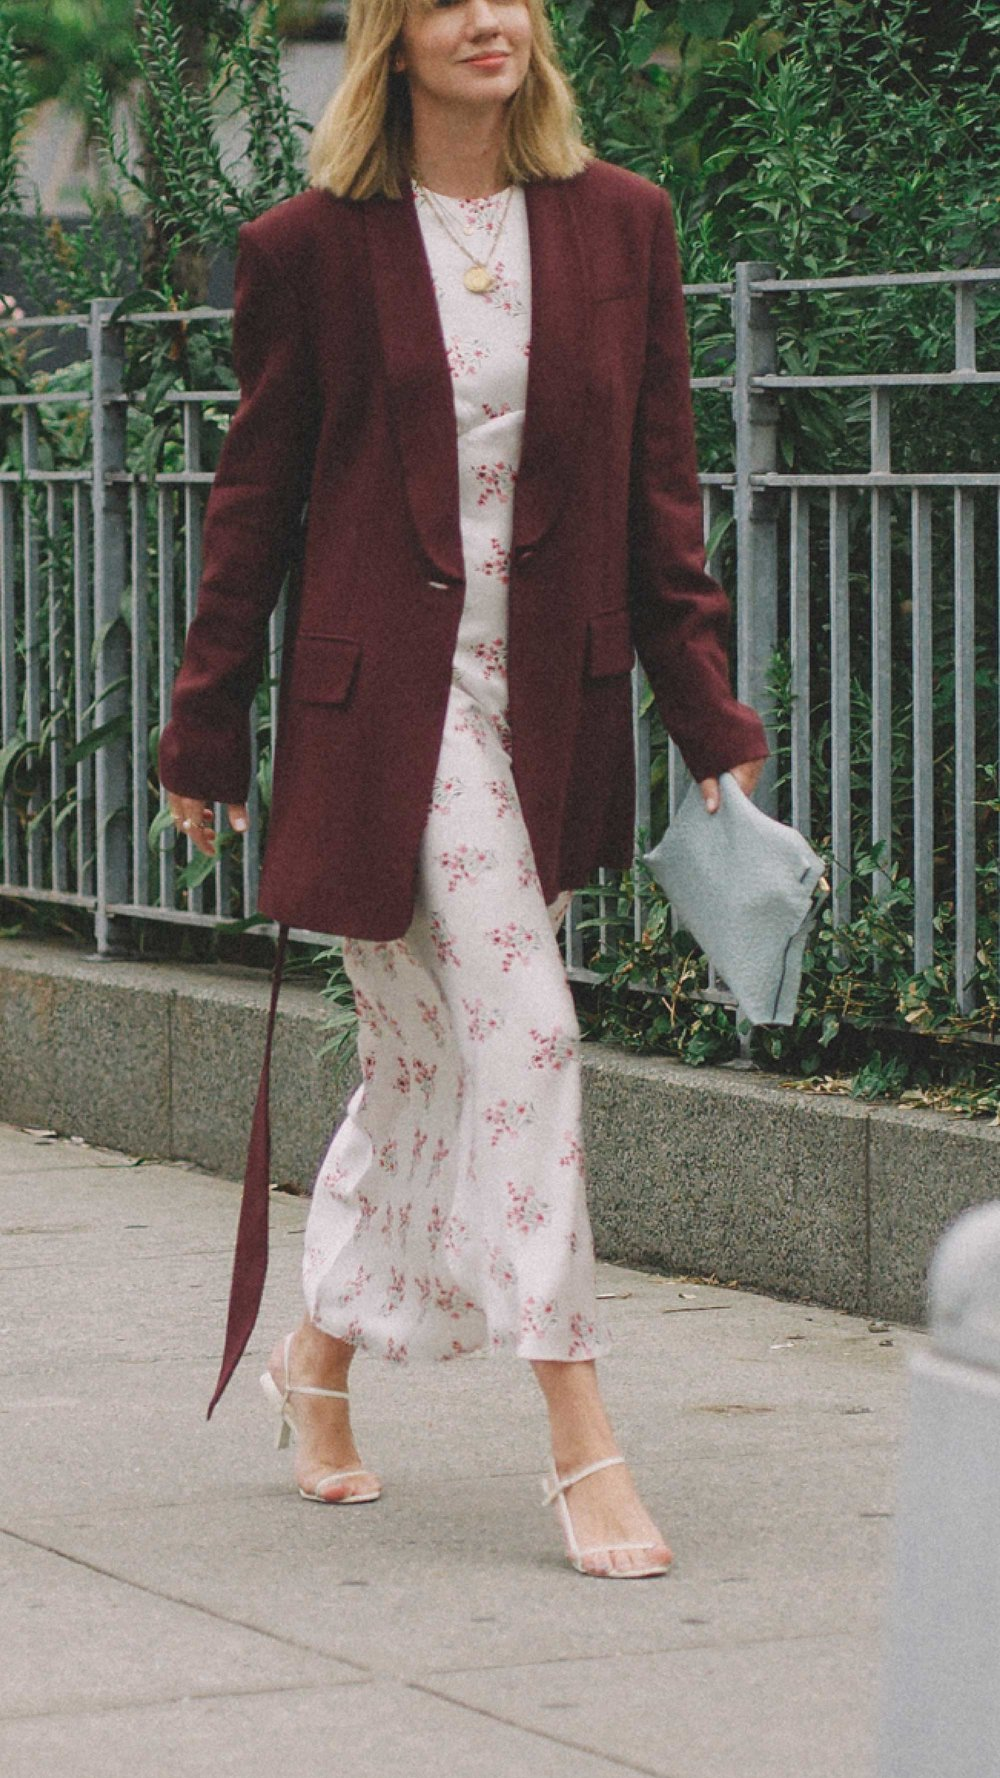 New-York-Fashion-Week-NYFW-SS18-street-style-day-five-SS18-3.jpg